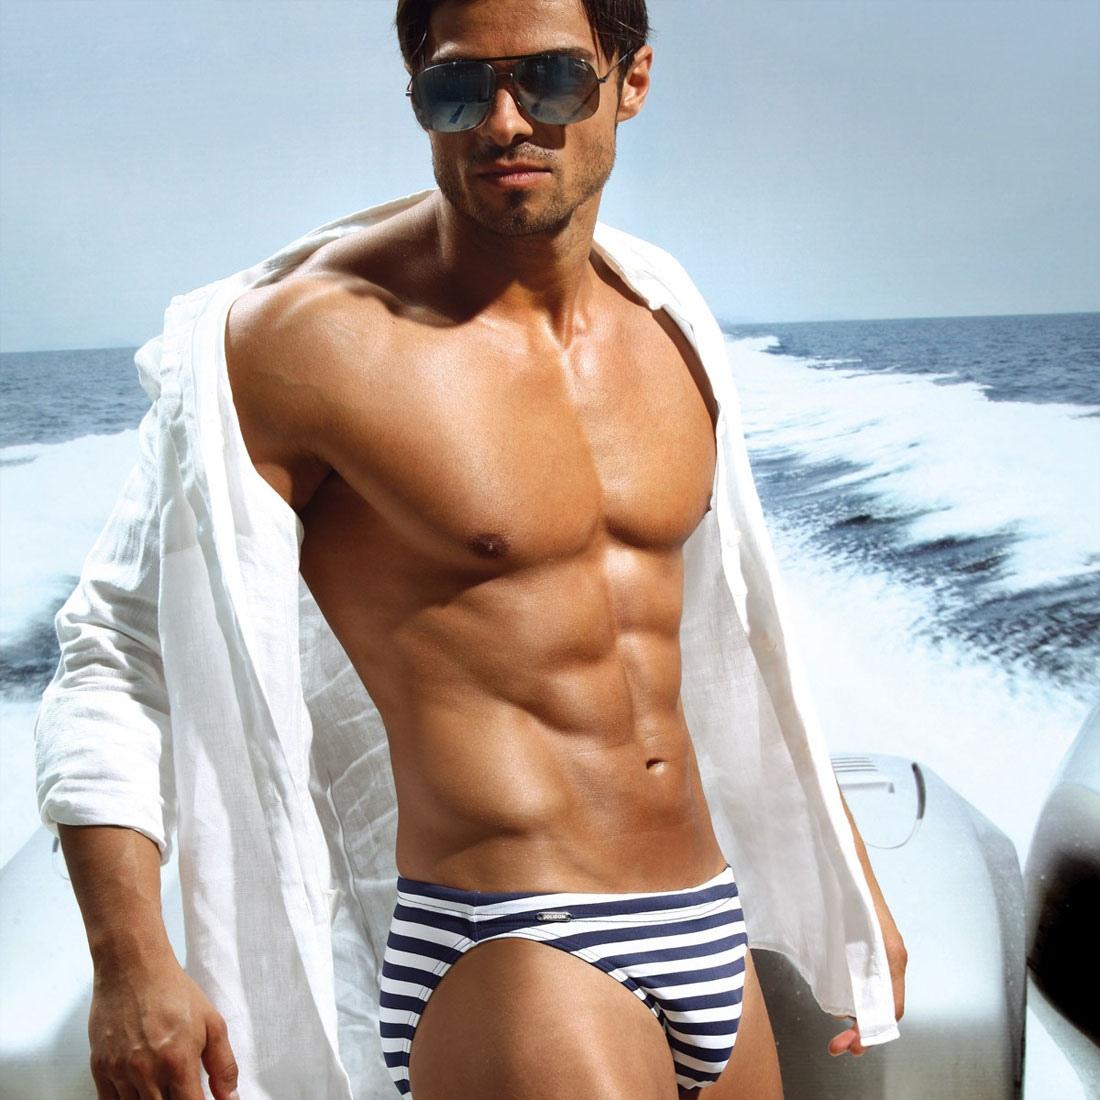 jolidon-swimwear-1311-01